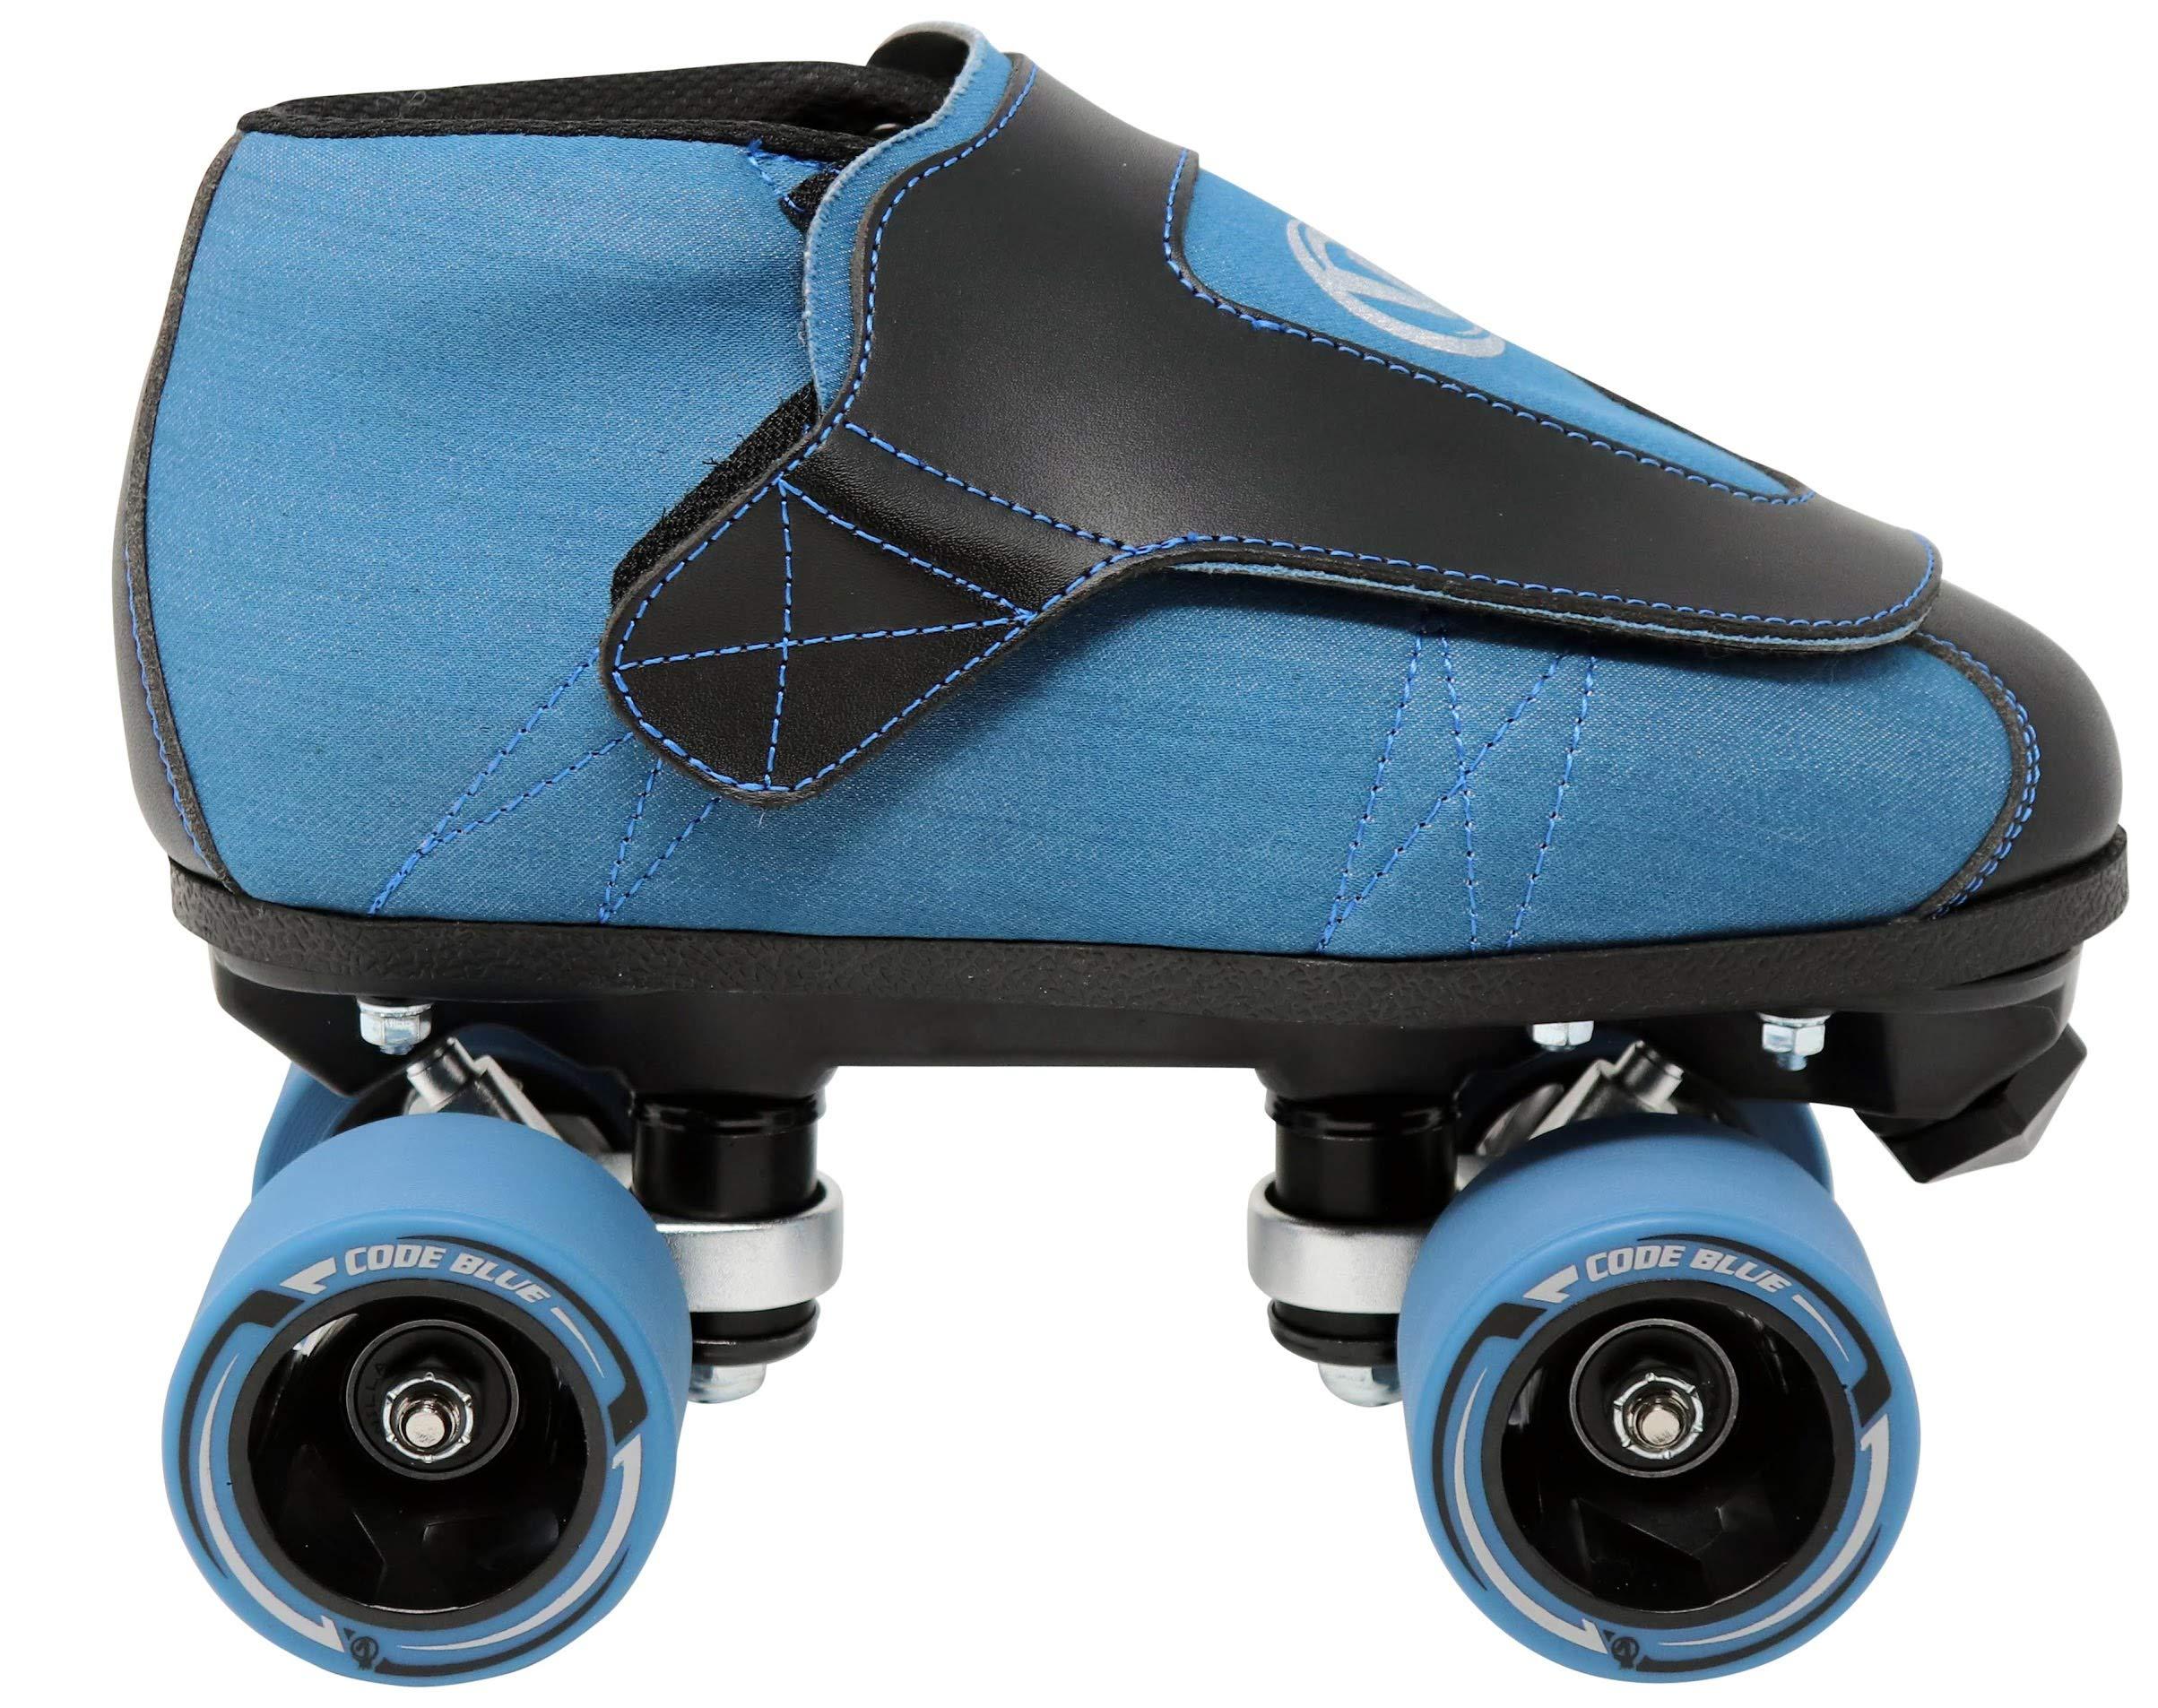 VNLA Code Blue Jam Skate - Mens & Womens Speed Skates - Quad Skates for Women & Men - Adjustable Roller Skate/Rollerskates - Outdoor & Indoor Adult Quad Skate - Kid/Kids Roller Skates (Size 9) by VNLA (Image #2)